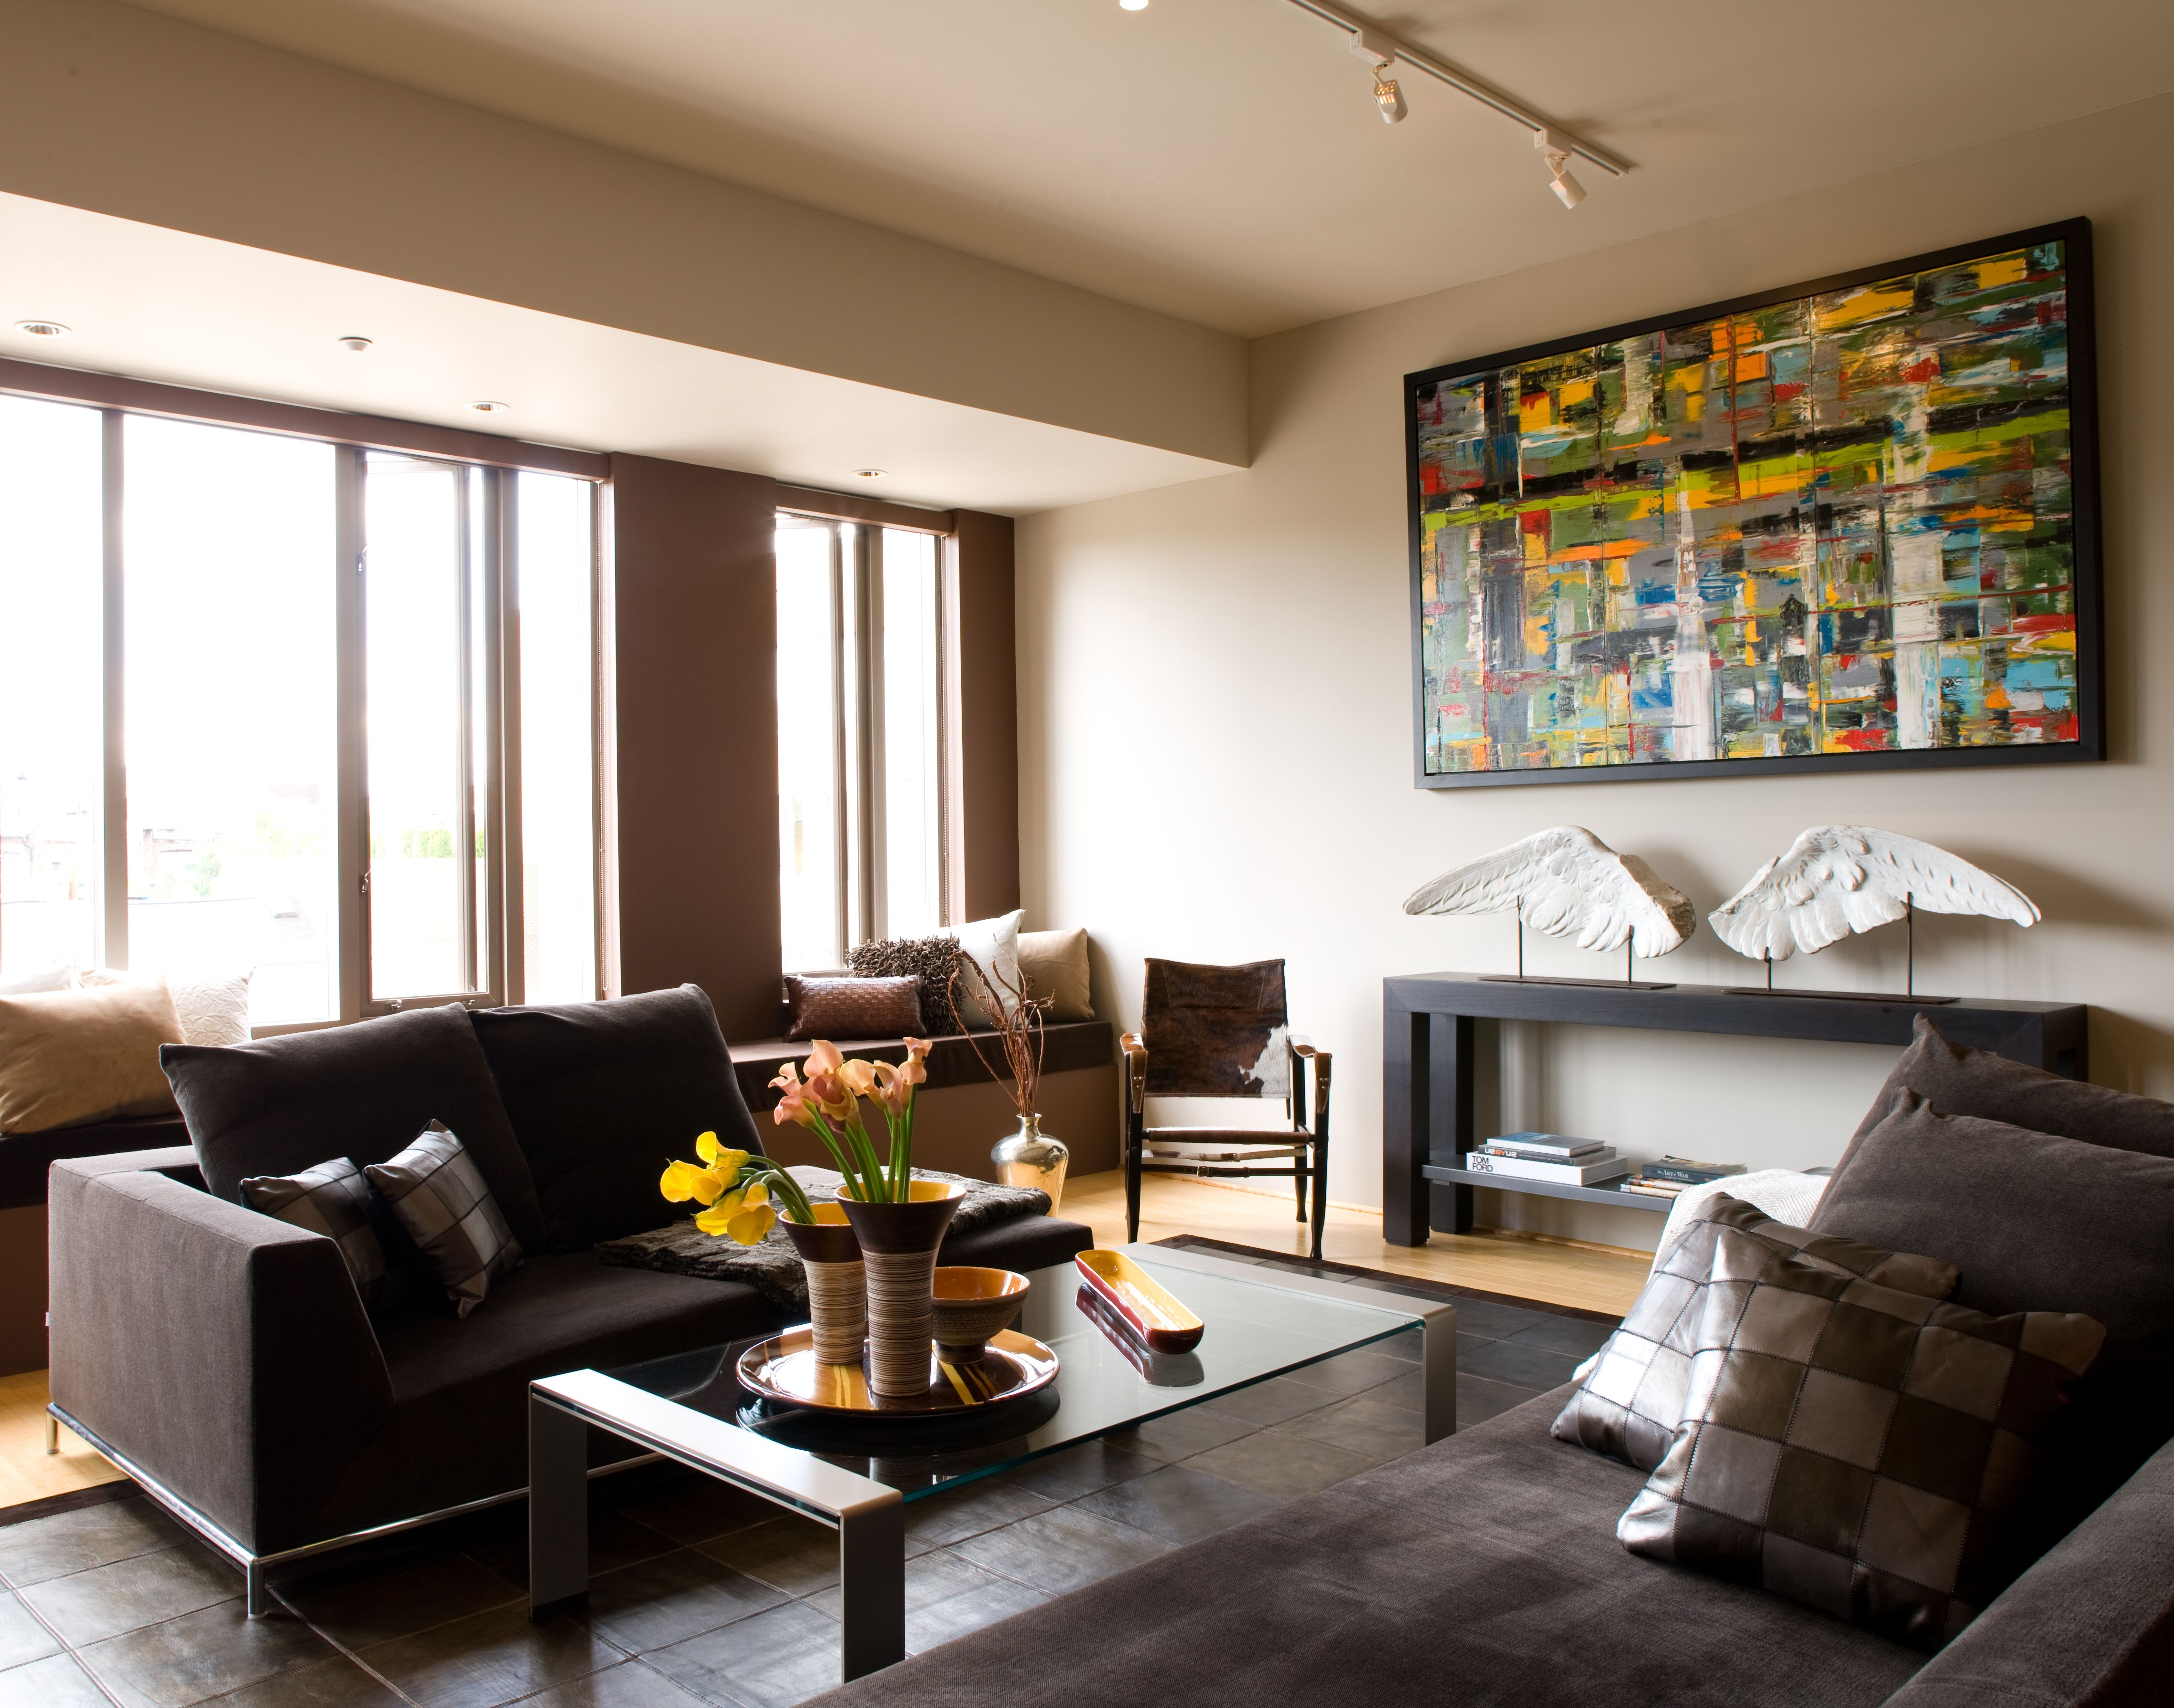 We supply modern stylish sleek and artisanal interior pieces